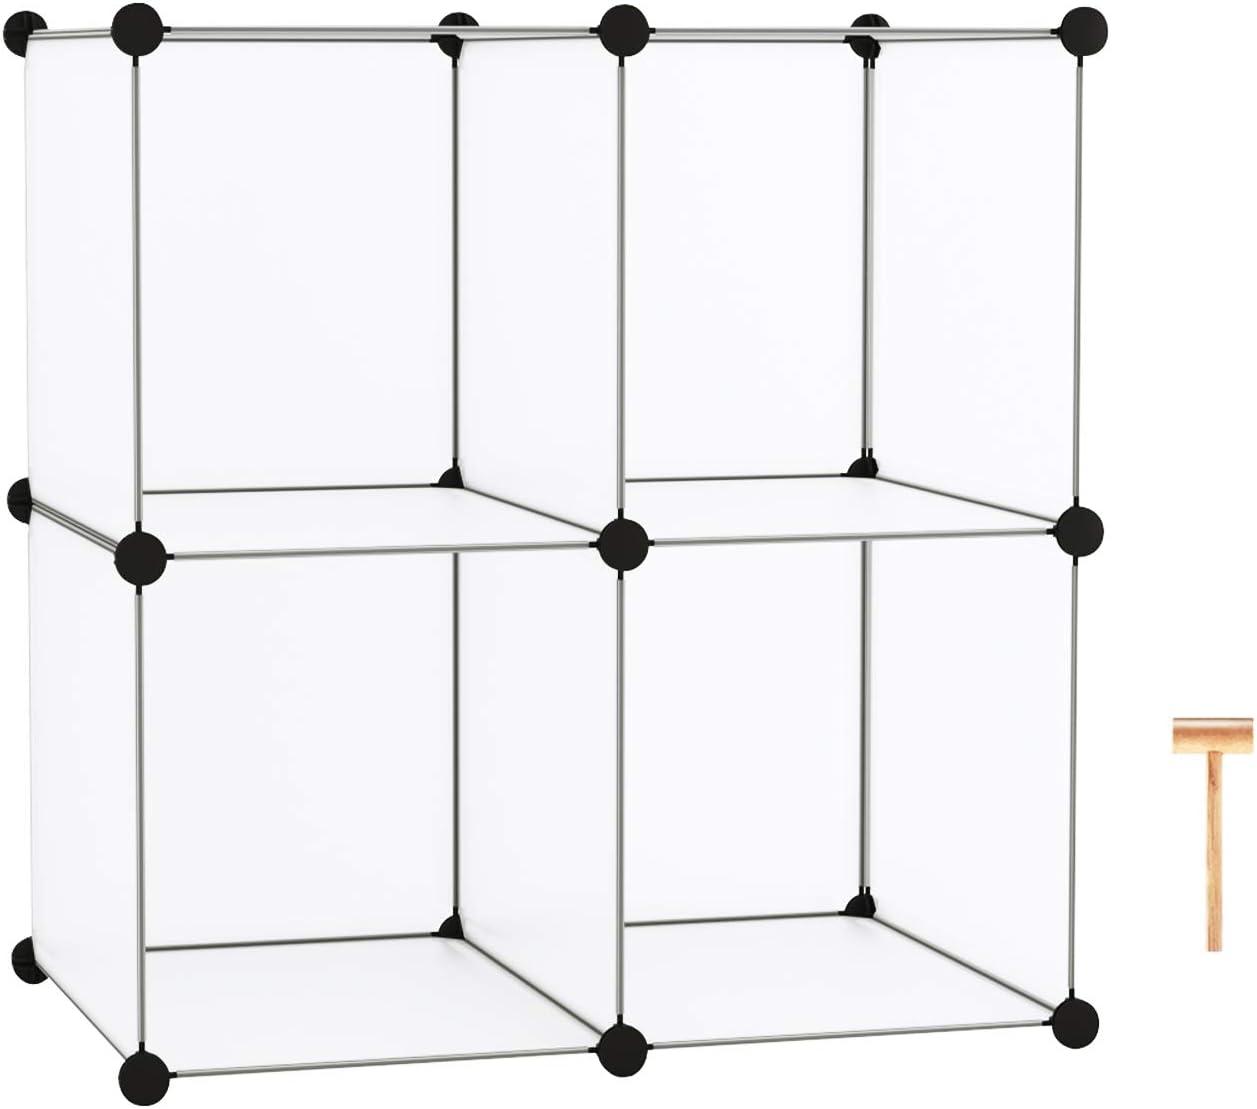 "C&AHOME Cube Storage Organizer, 4-Cube Shelving Units, DIY Closet Storage, Modular Book Shelf, Ideal for Bedroom, Living Room, Office, 24.8""L x 12.4""W x 24.8""H Translucent White"